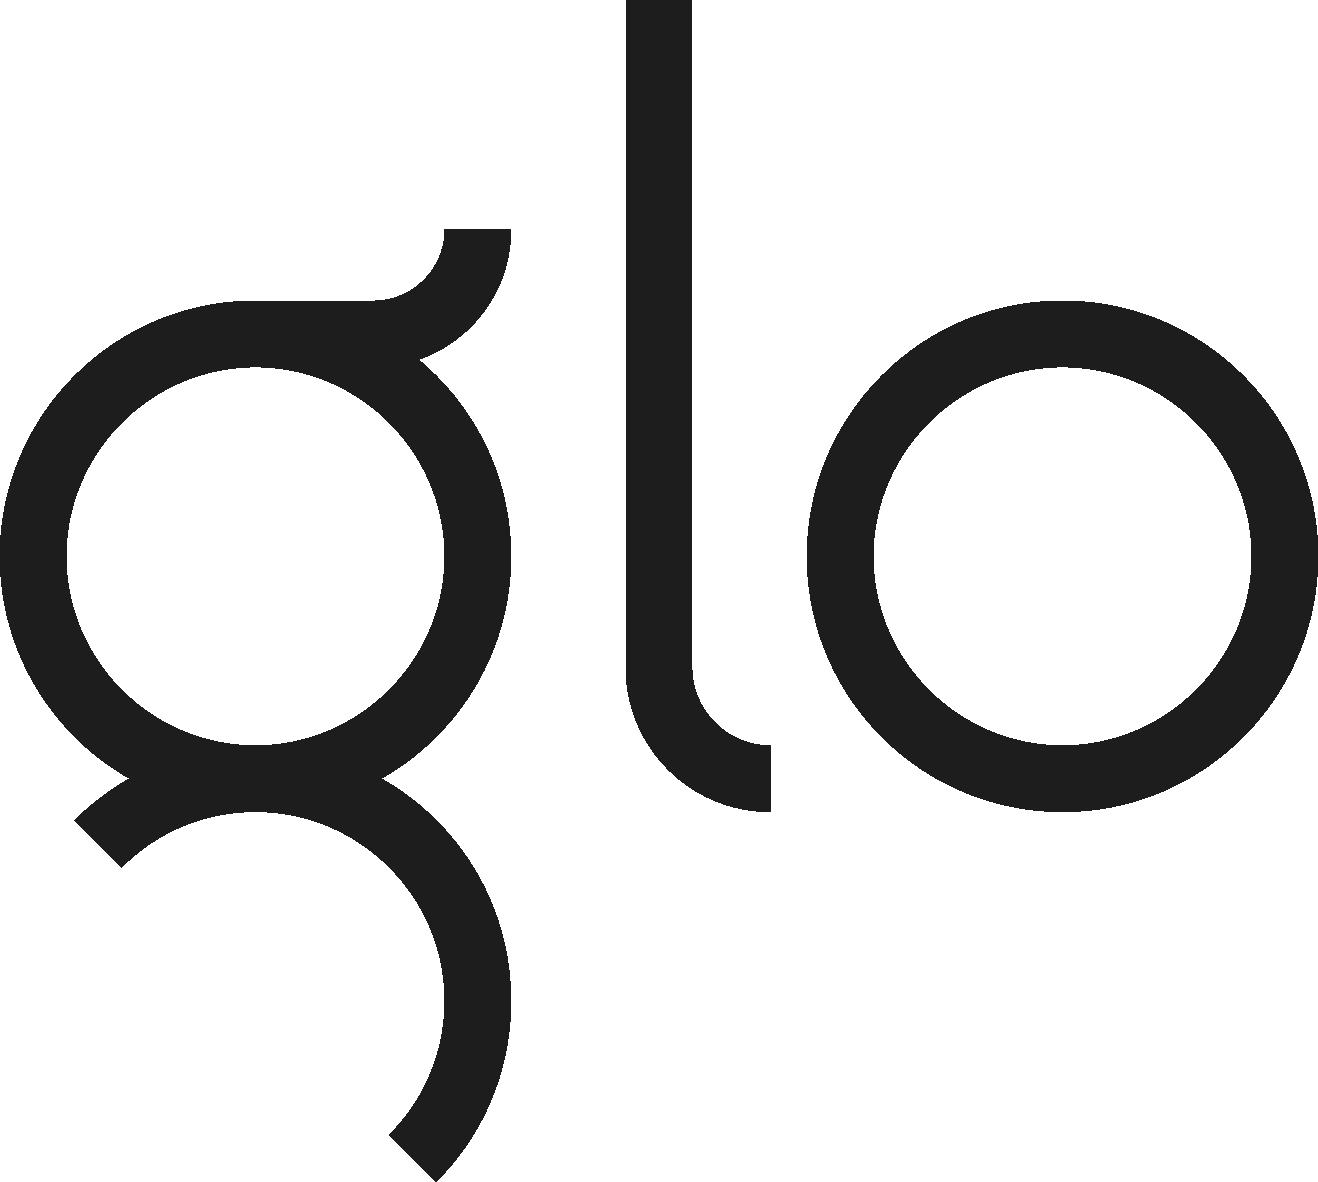 GLO_LOGO_[BLACK]_CMYK.png